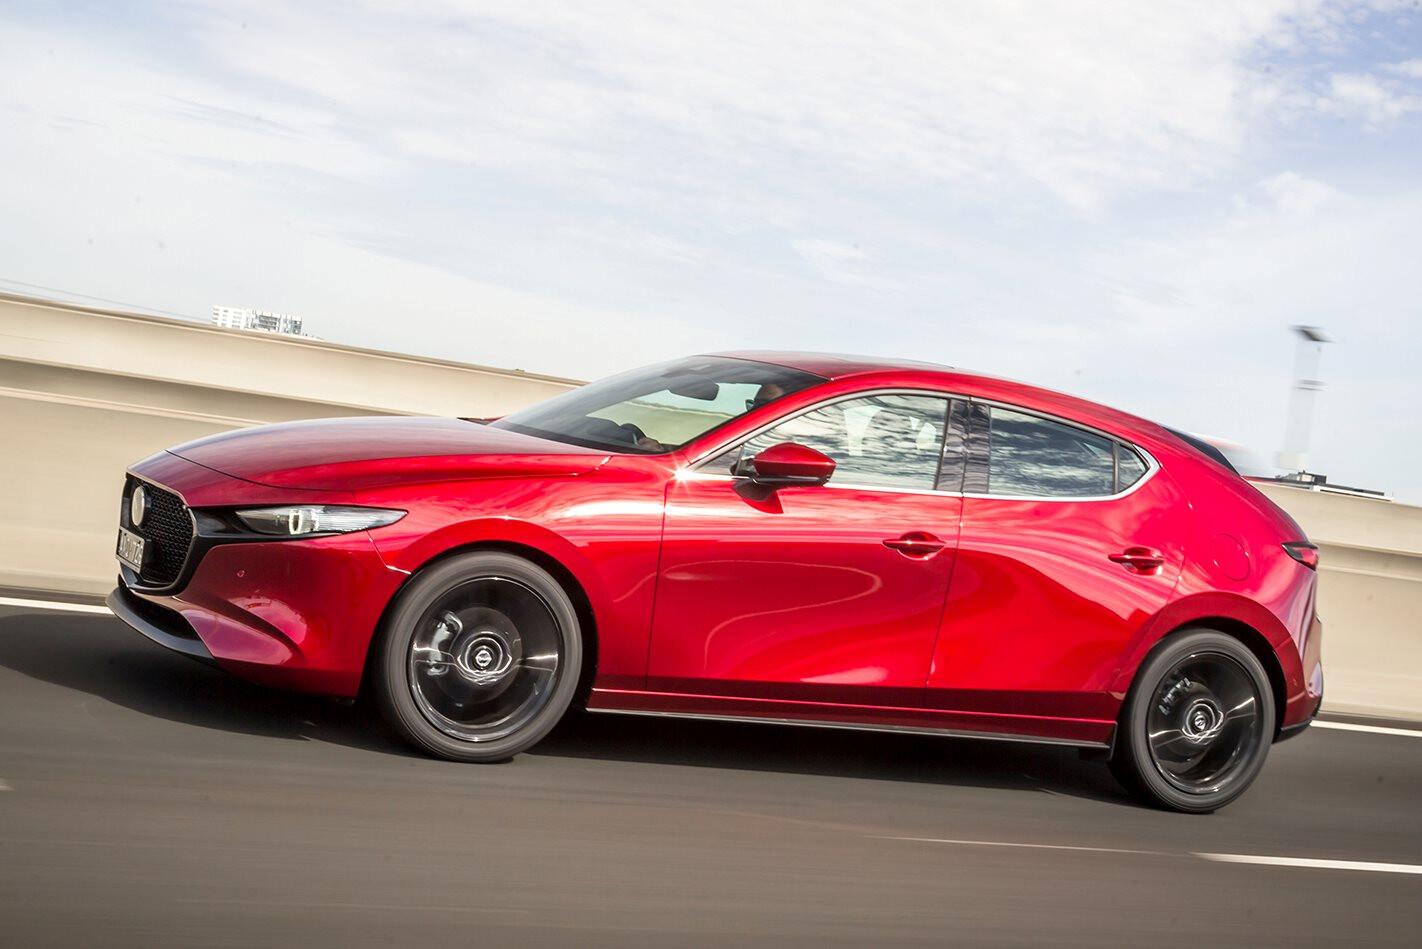 2019 Mazda 3 Astina G25 hatch review